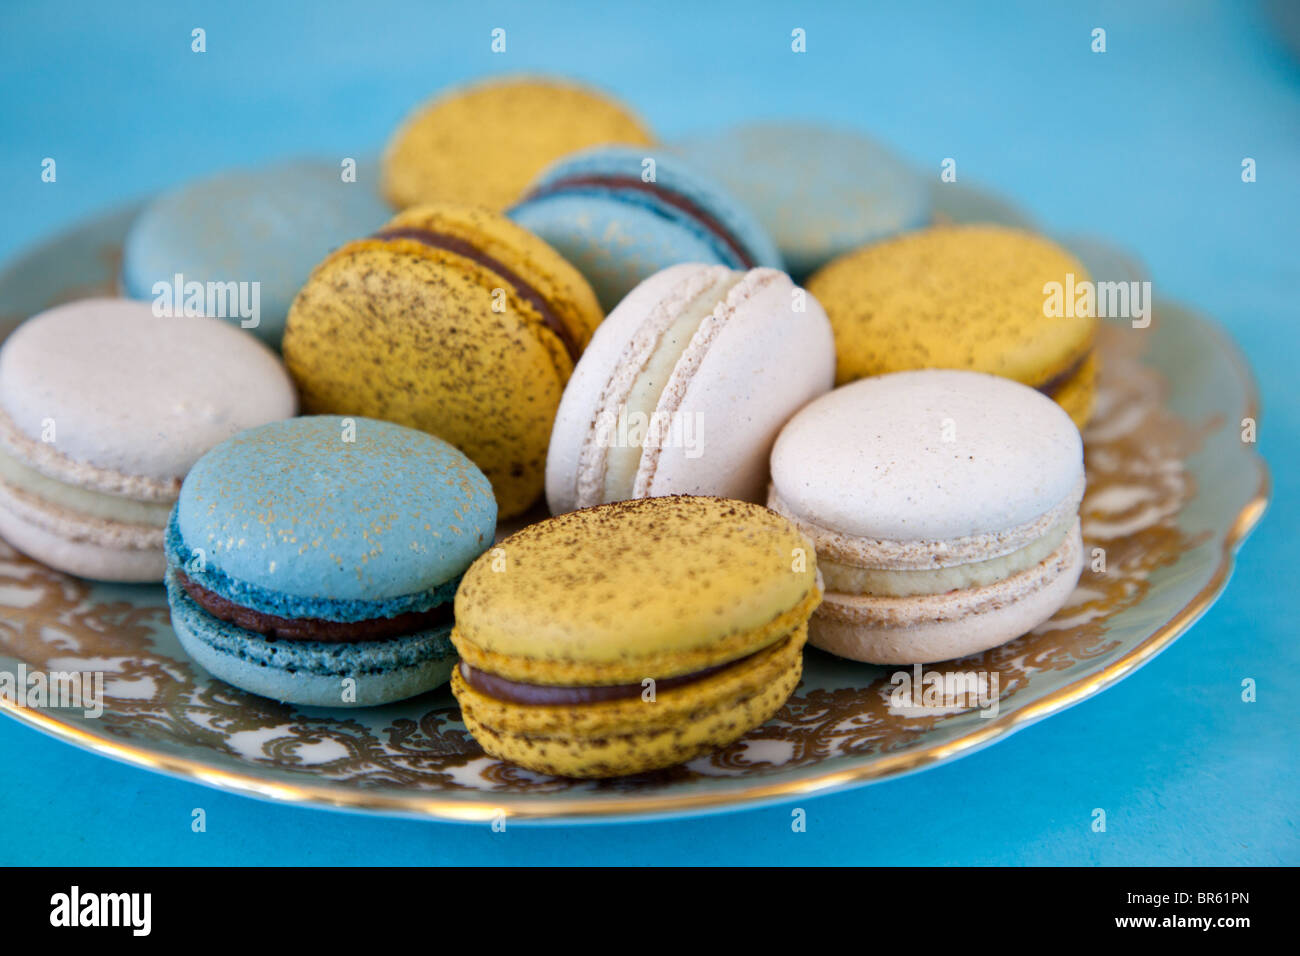 dessert plate of cookies - Stock Image